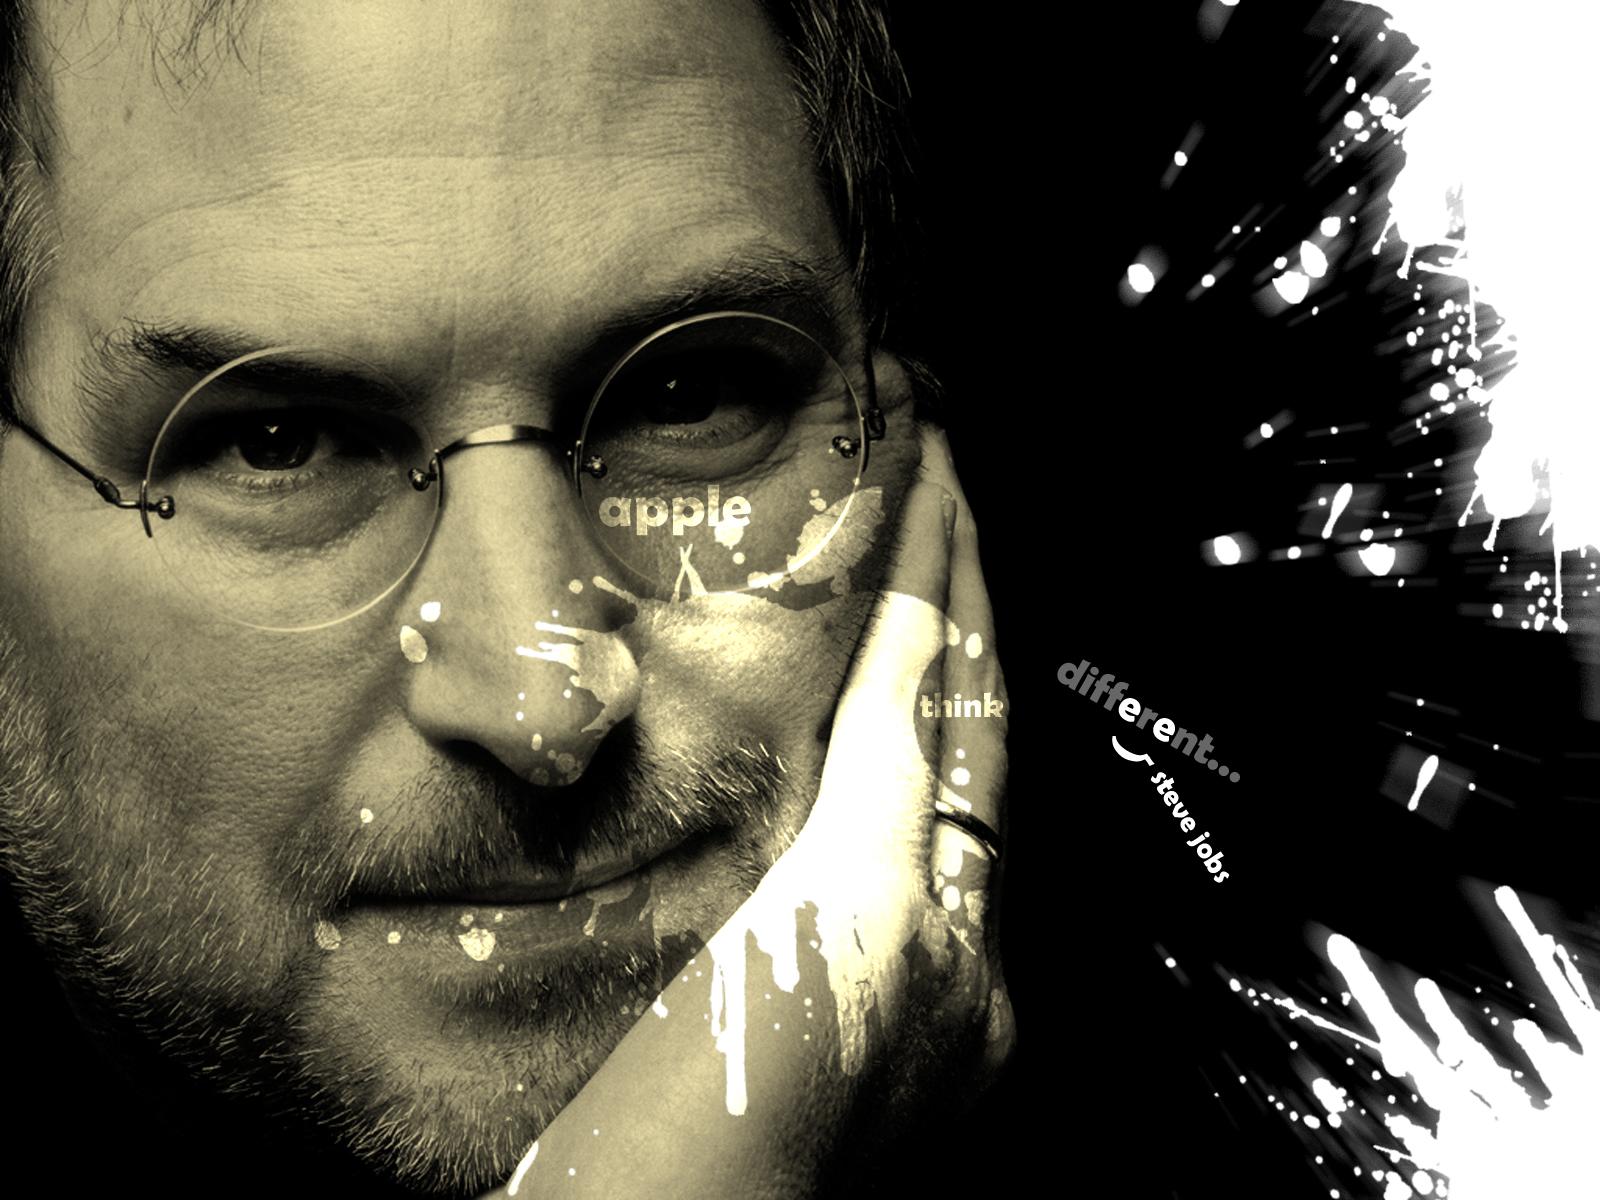 Steve Jobs Quote Tribute Design Hd Wallpaper 2012 Top